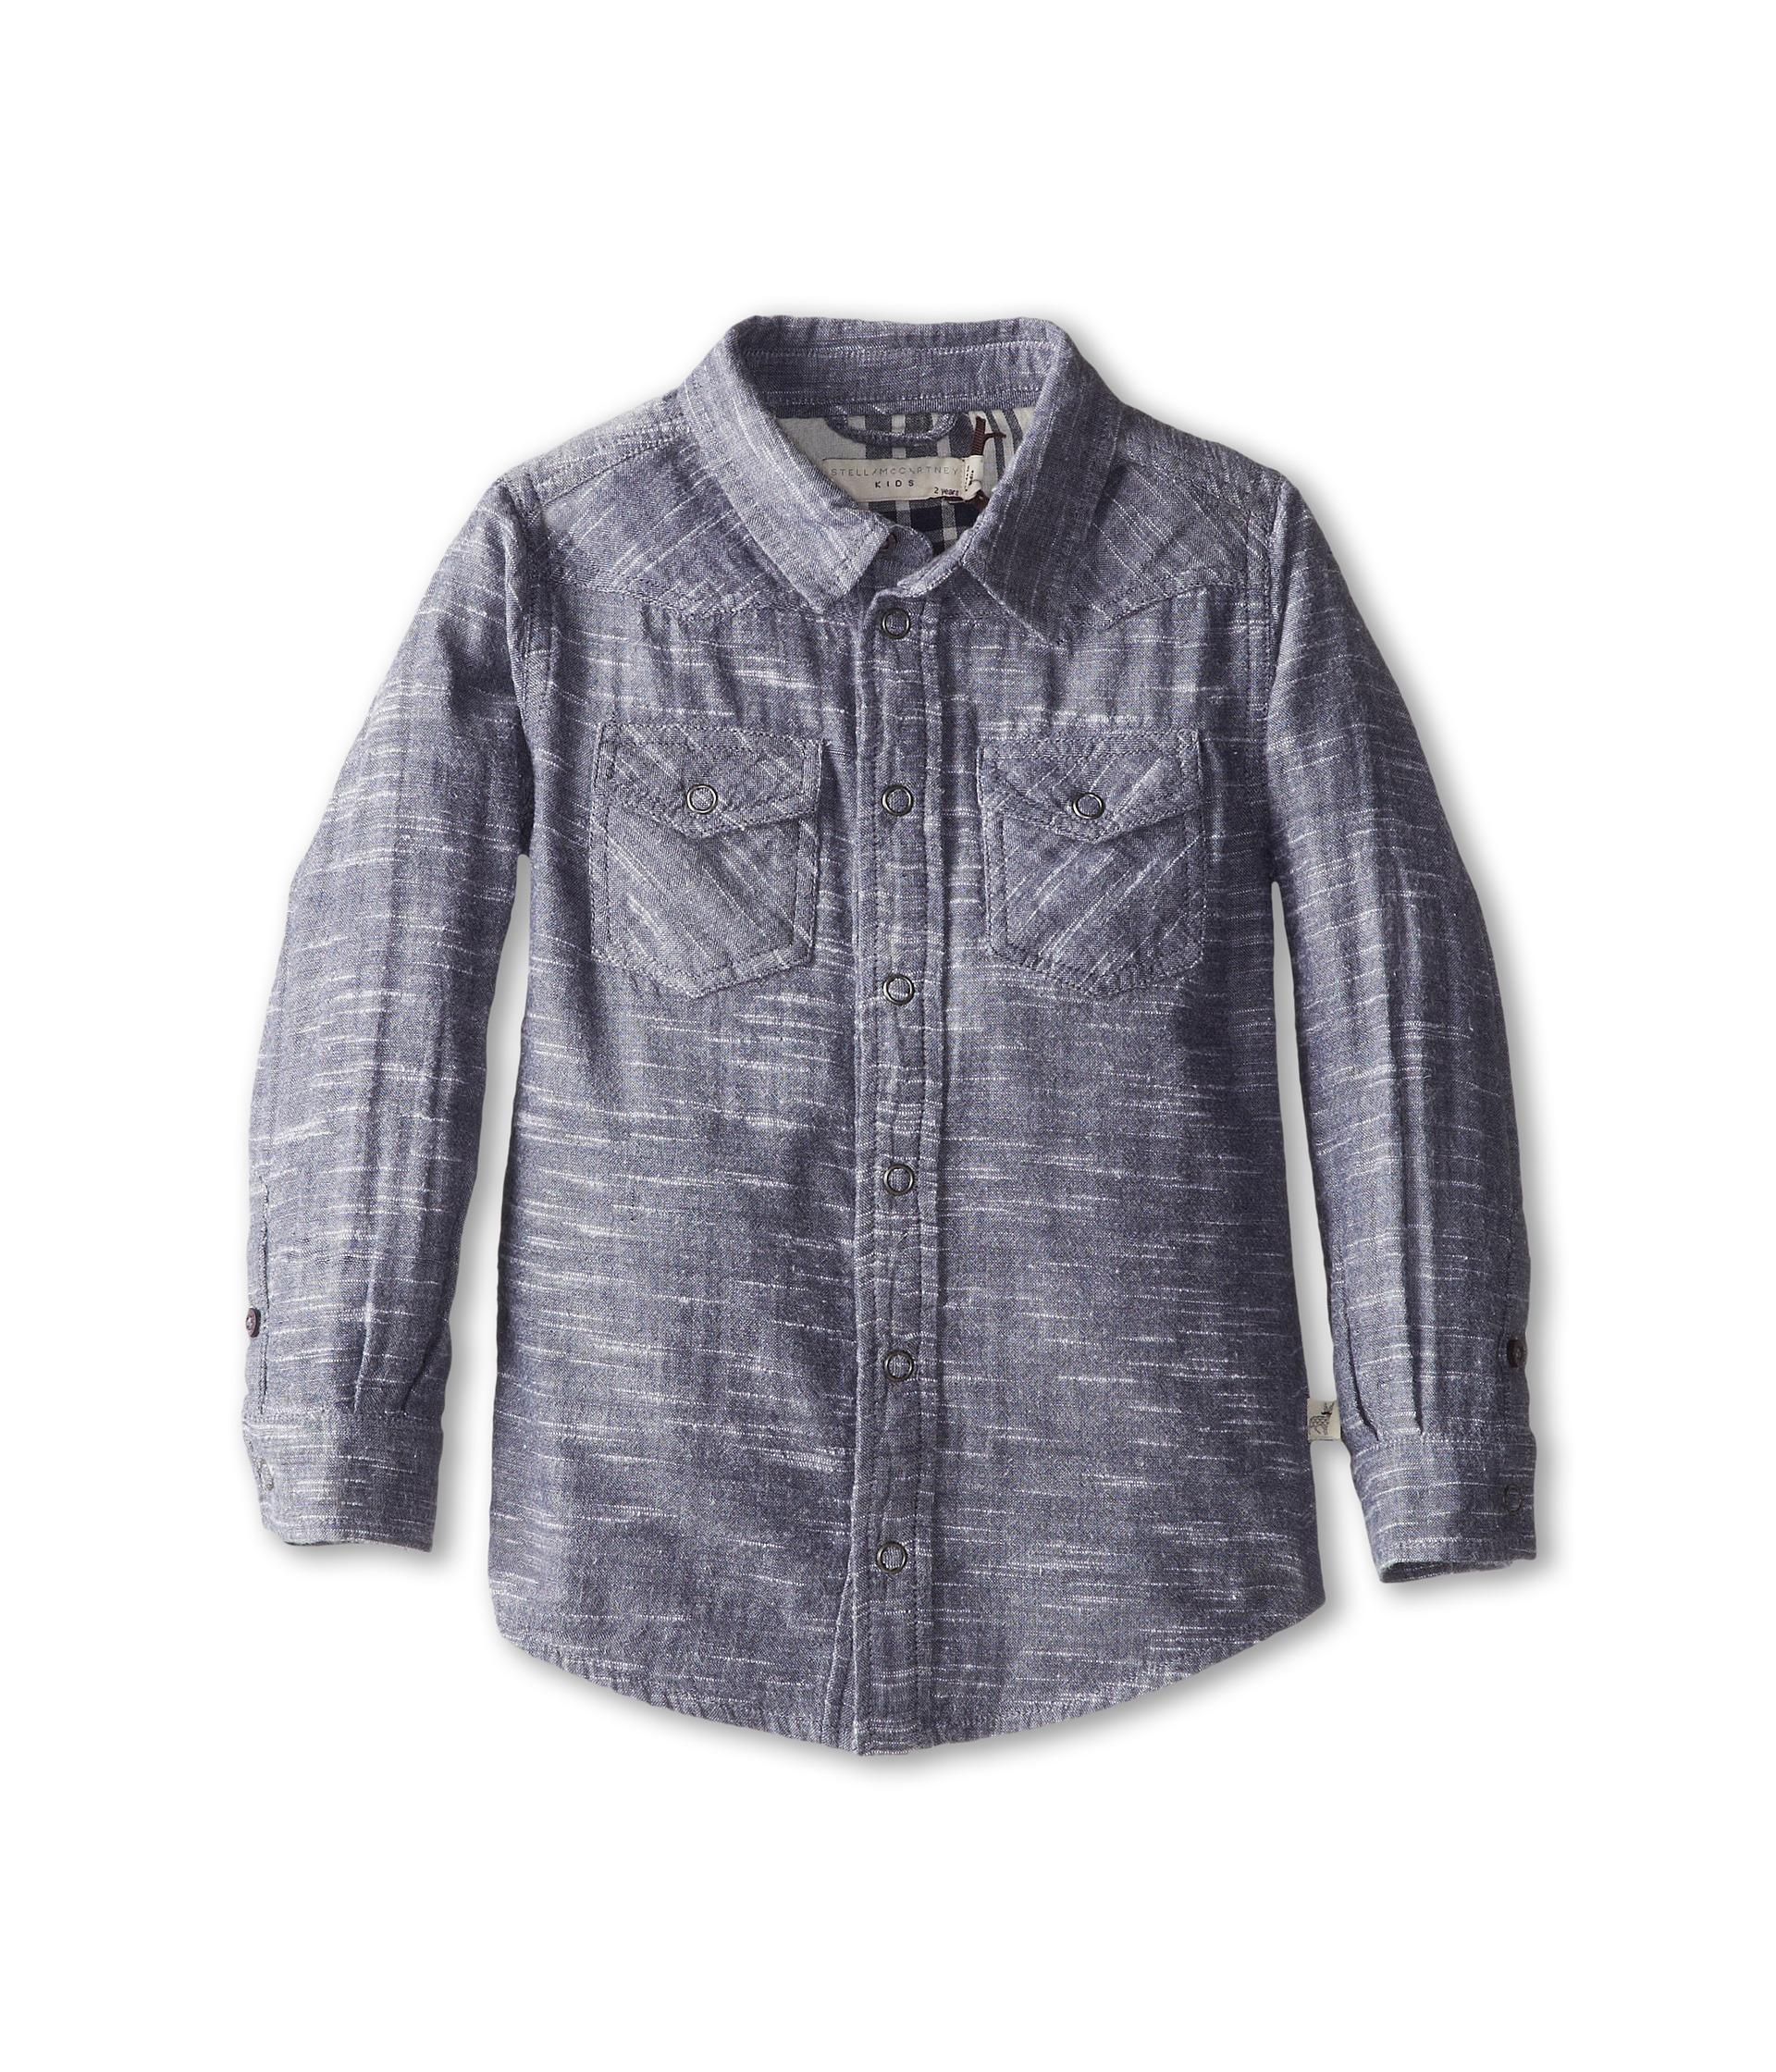 Stella mccartney kids alasdhair boys chambray button down for Chambray shirt for kids